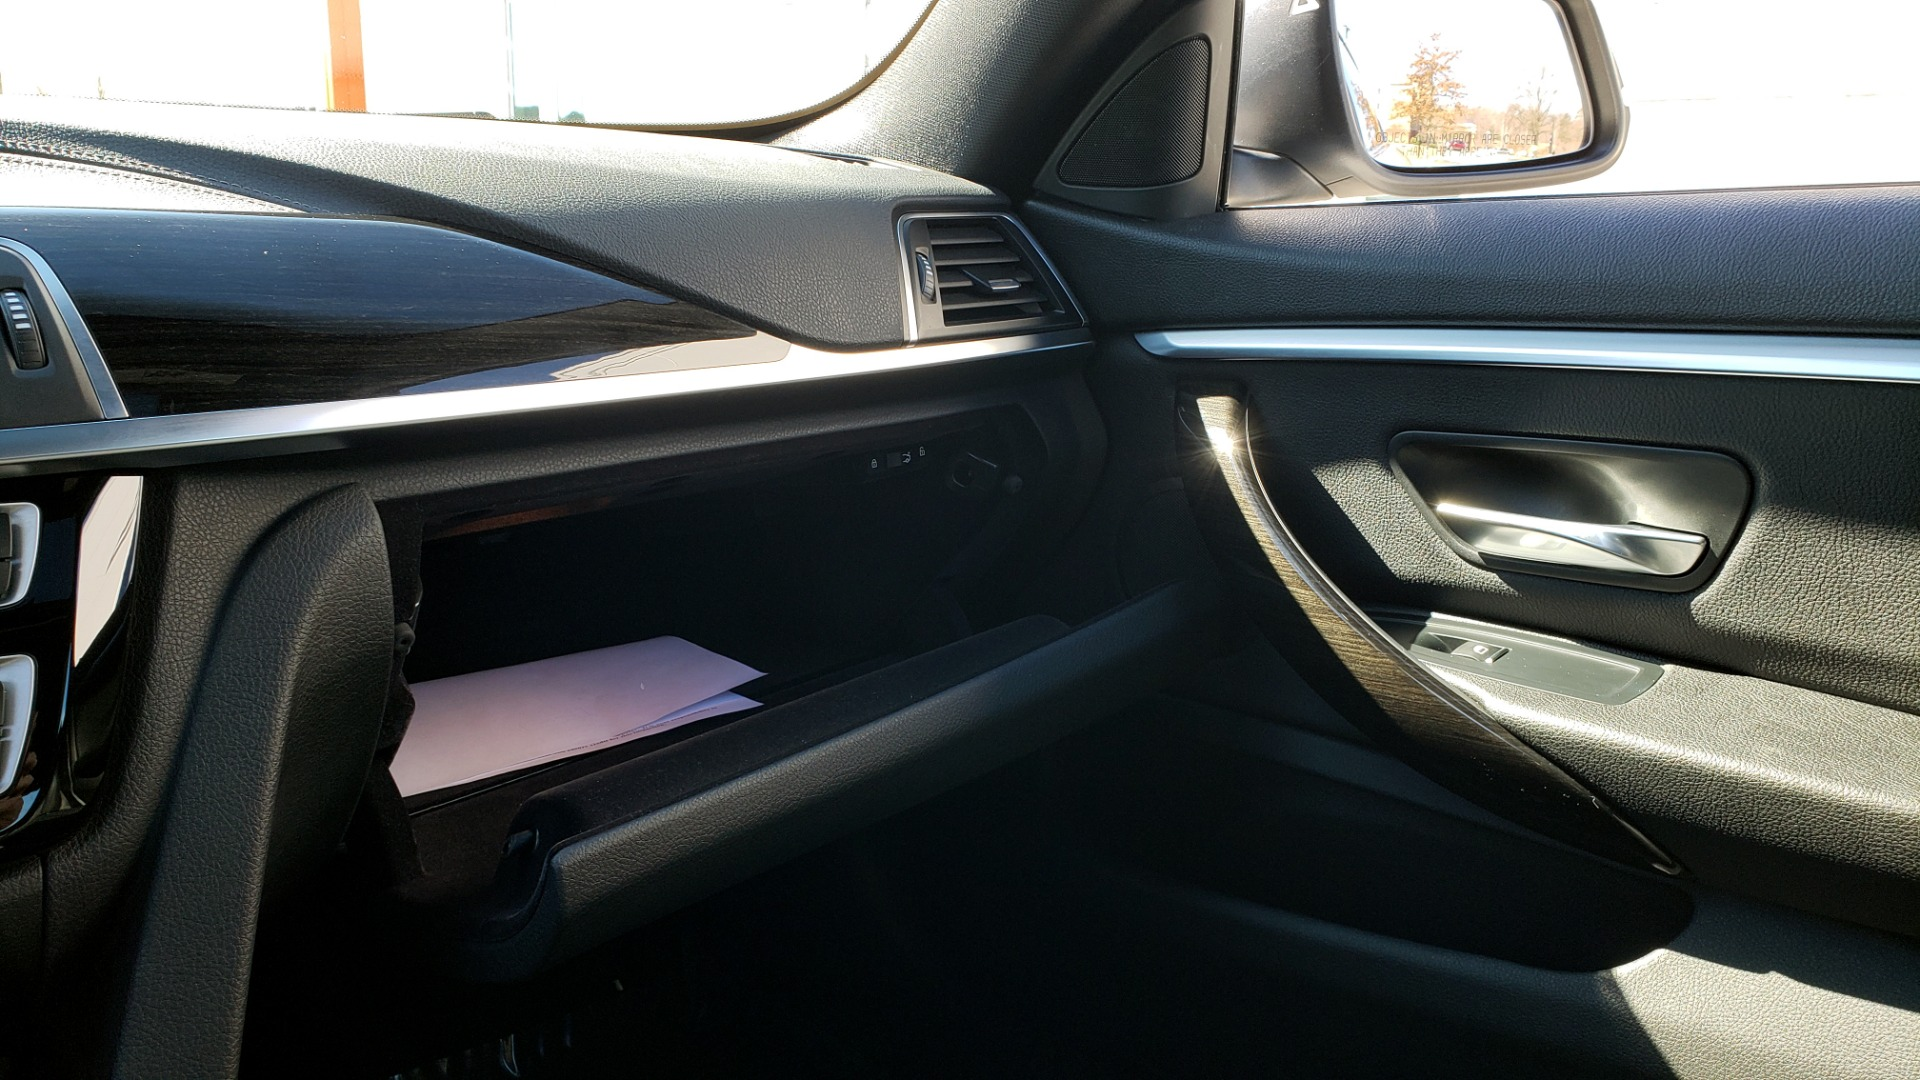 Used 2018 BMW 4 SERIES 430IXDRIVE / PREMIUM / NAV / SUNROOF / ESSENTIALS PKG for sale $28,995 at Formula Imports in Charlotte NC 28227 53